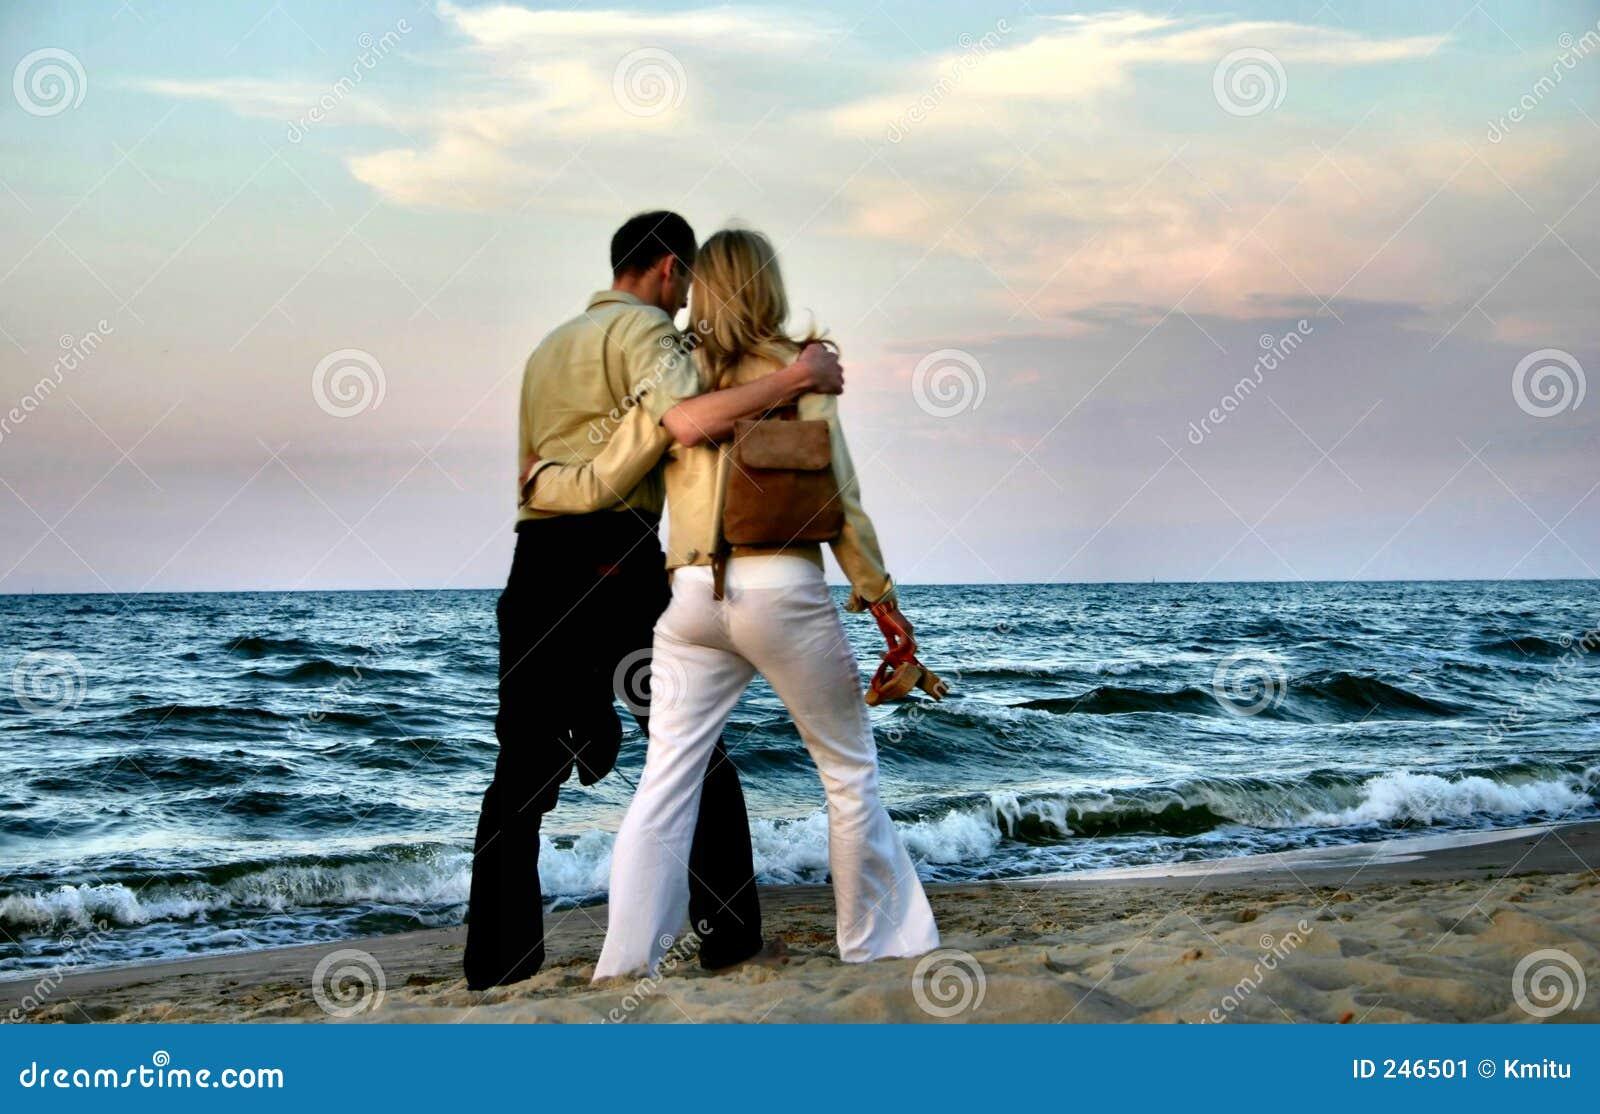 Loving couple stroll